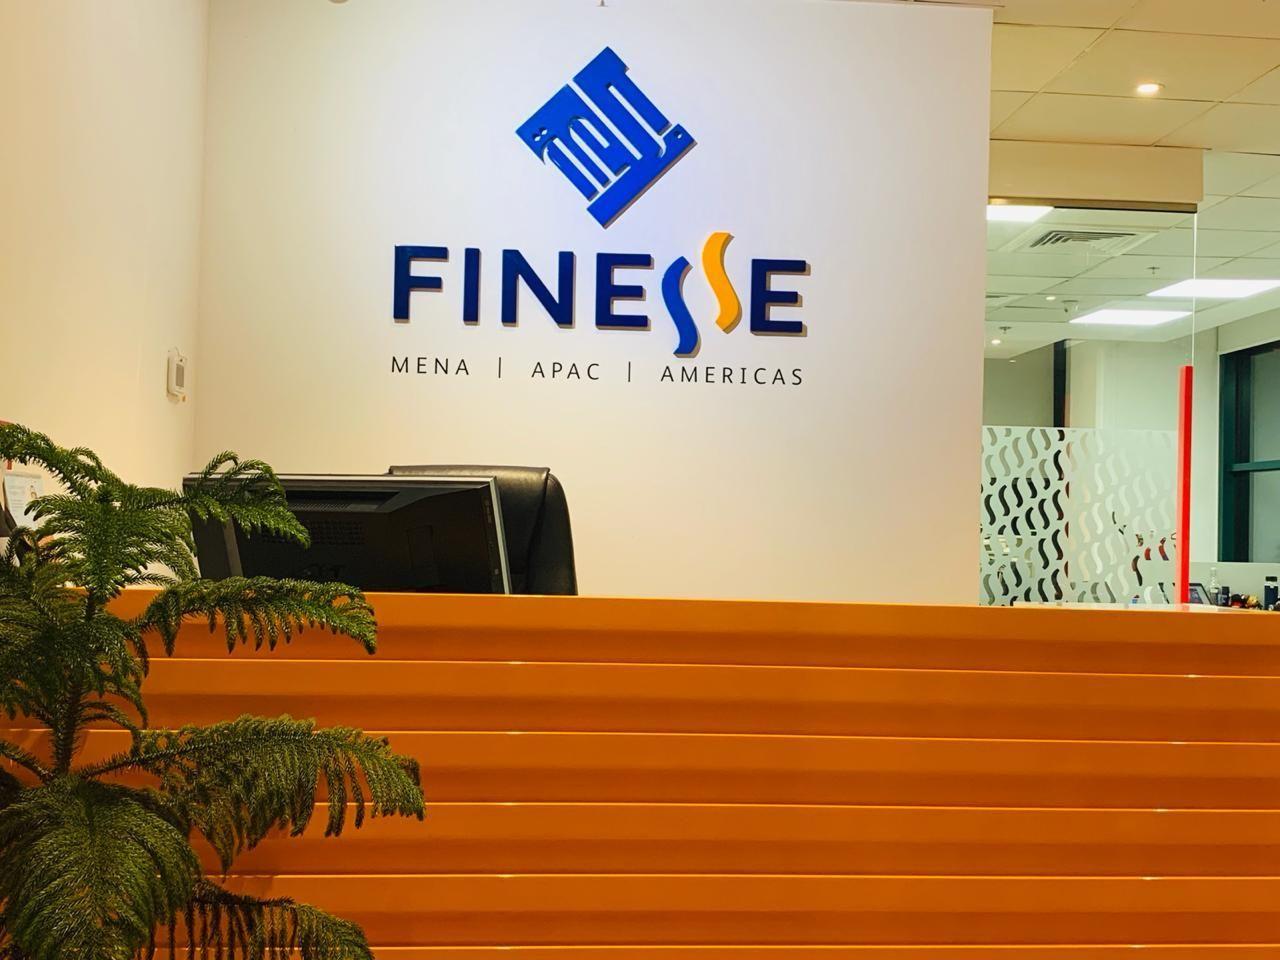 Finesse FZ LLC